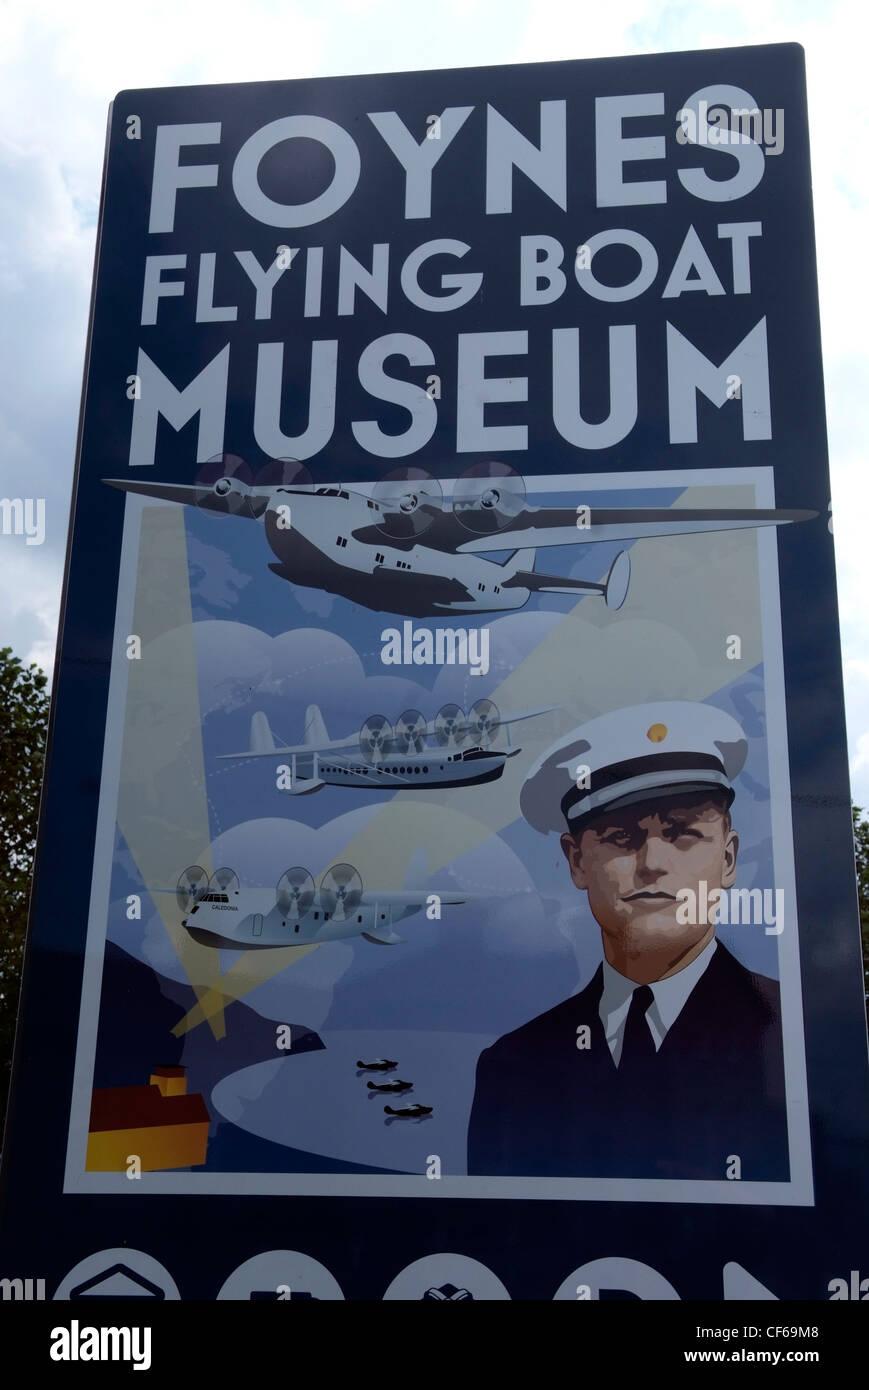 Ireland, Limerick, Foynes Flying Boat Museum - Stock Image